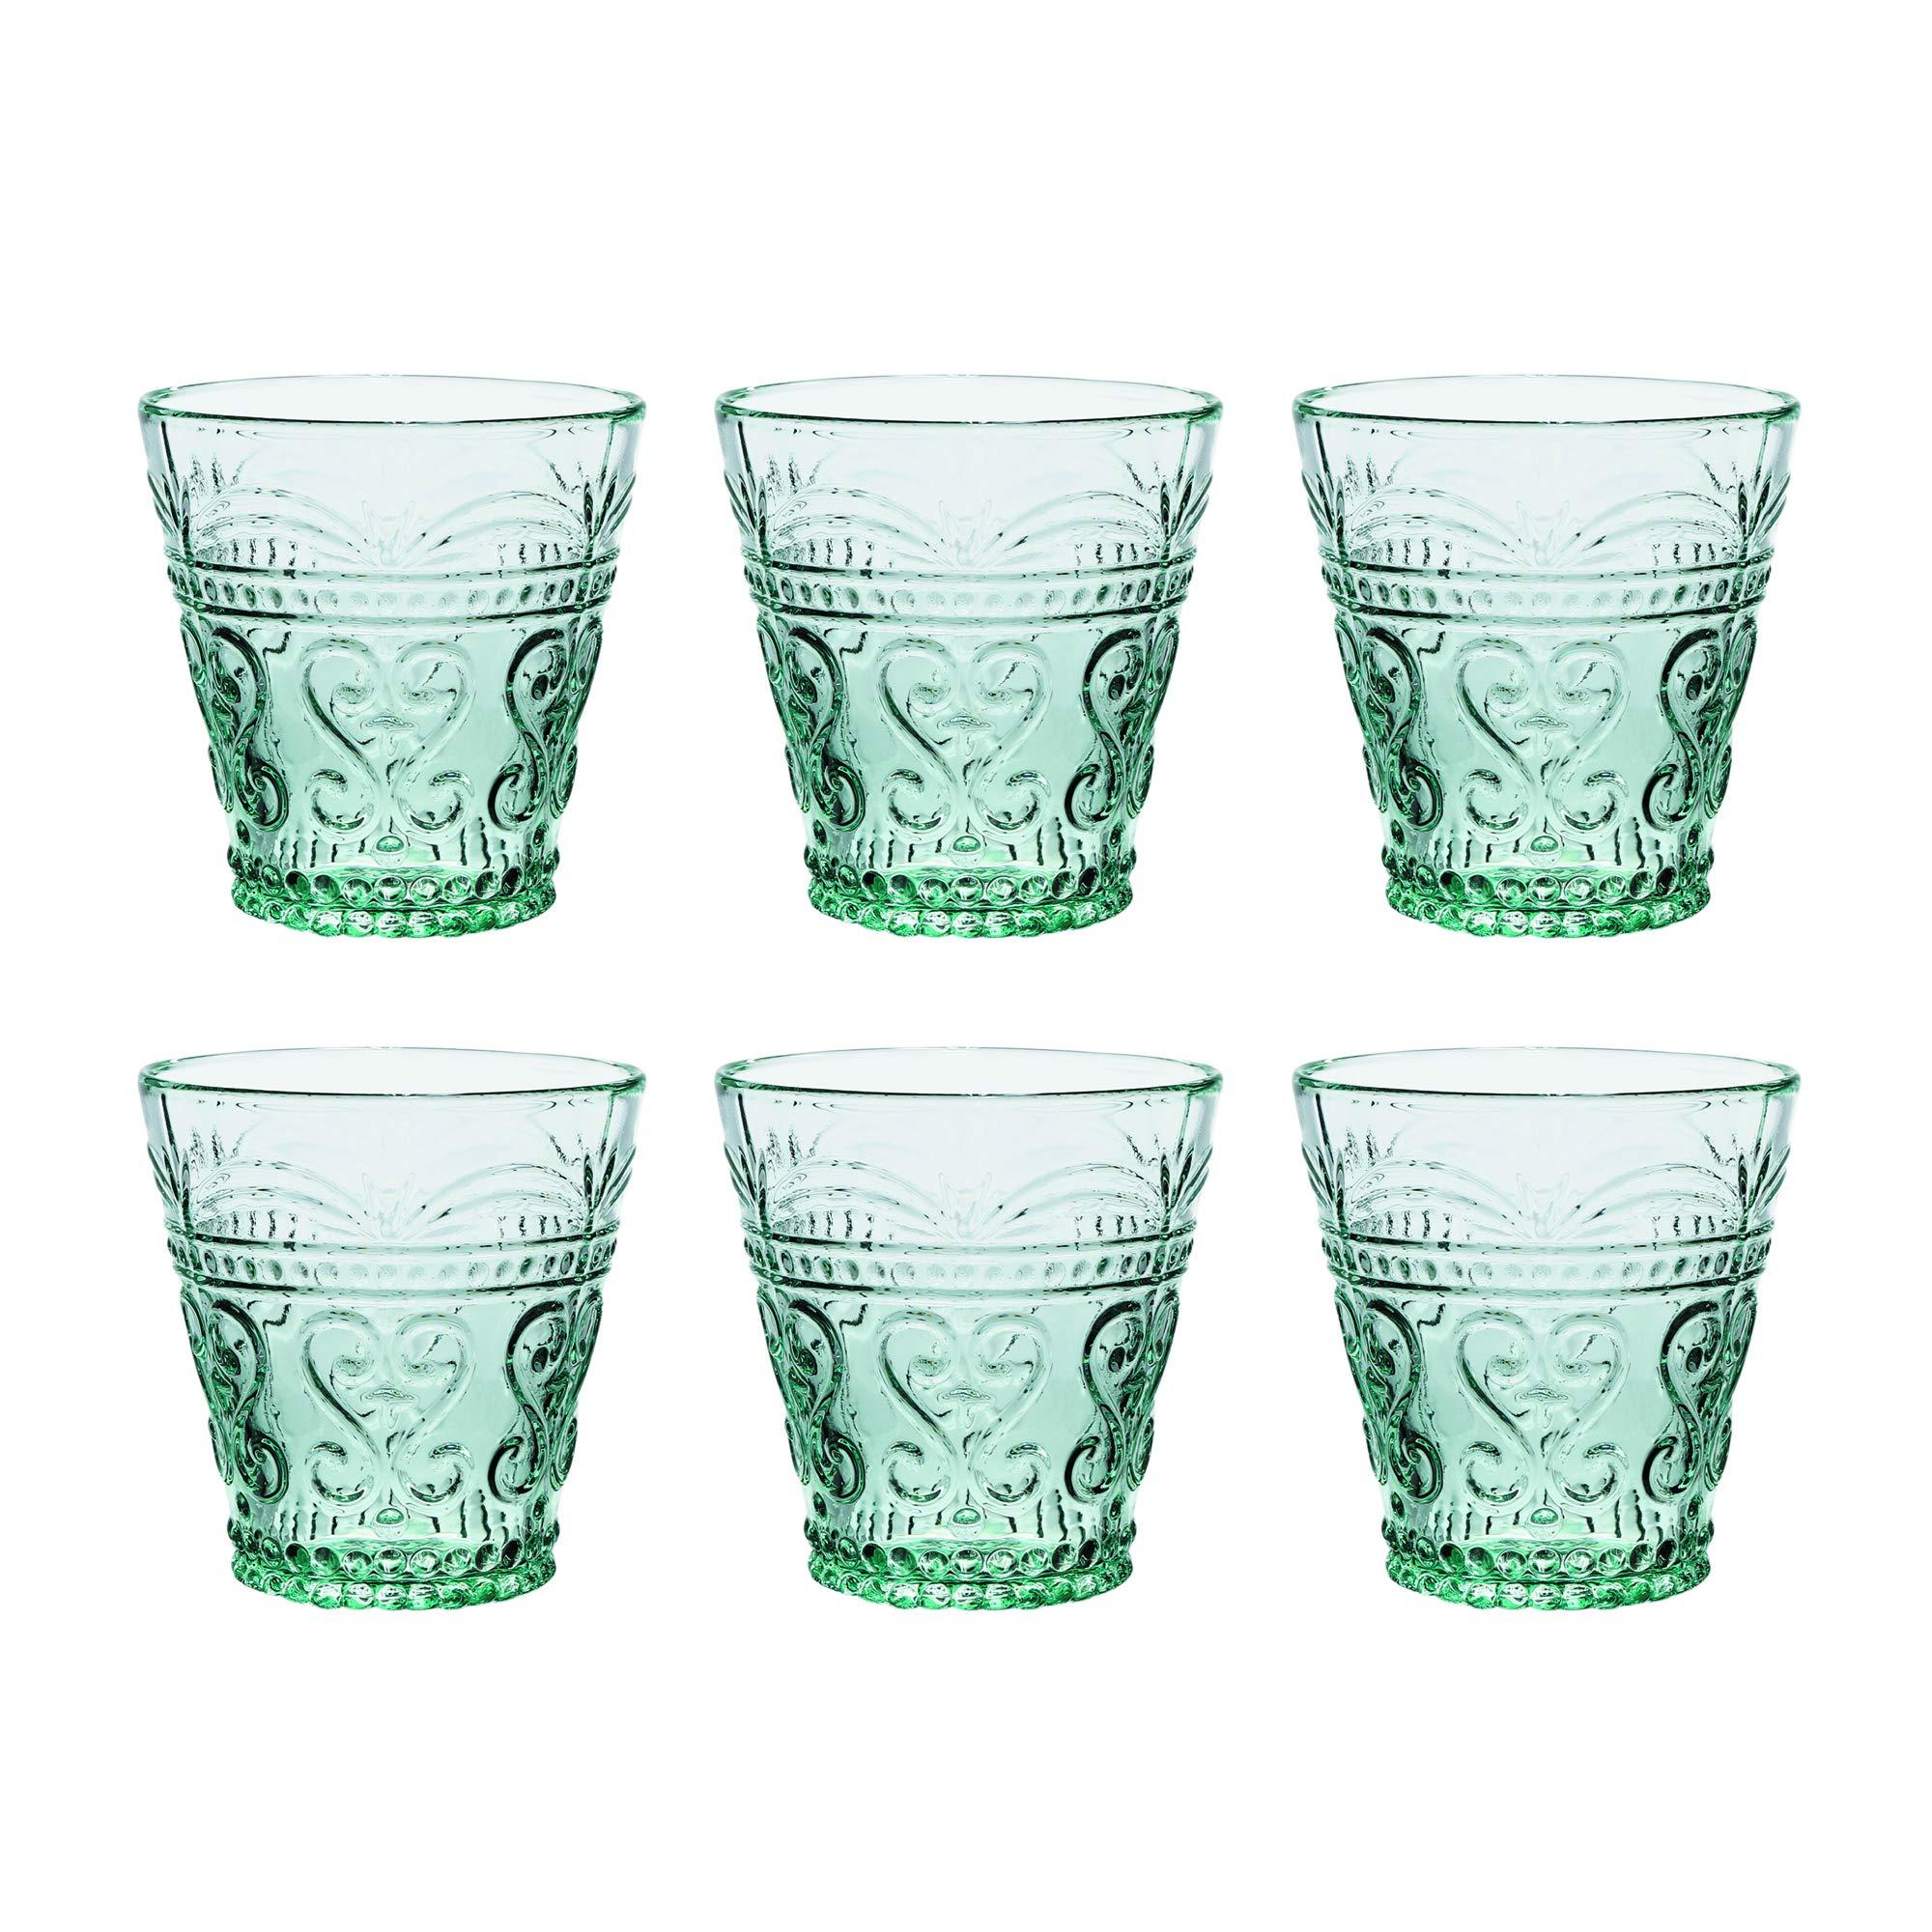 Kom Amsterdam 6AQM1 Aqua Waterglass, Soda Lime Glass, 240 milliliters, Green by Kom Amsterdam